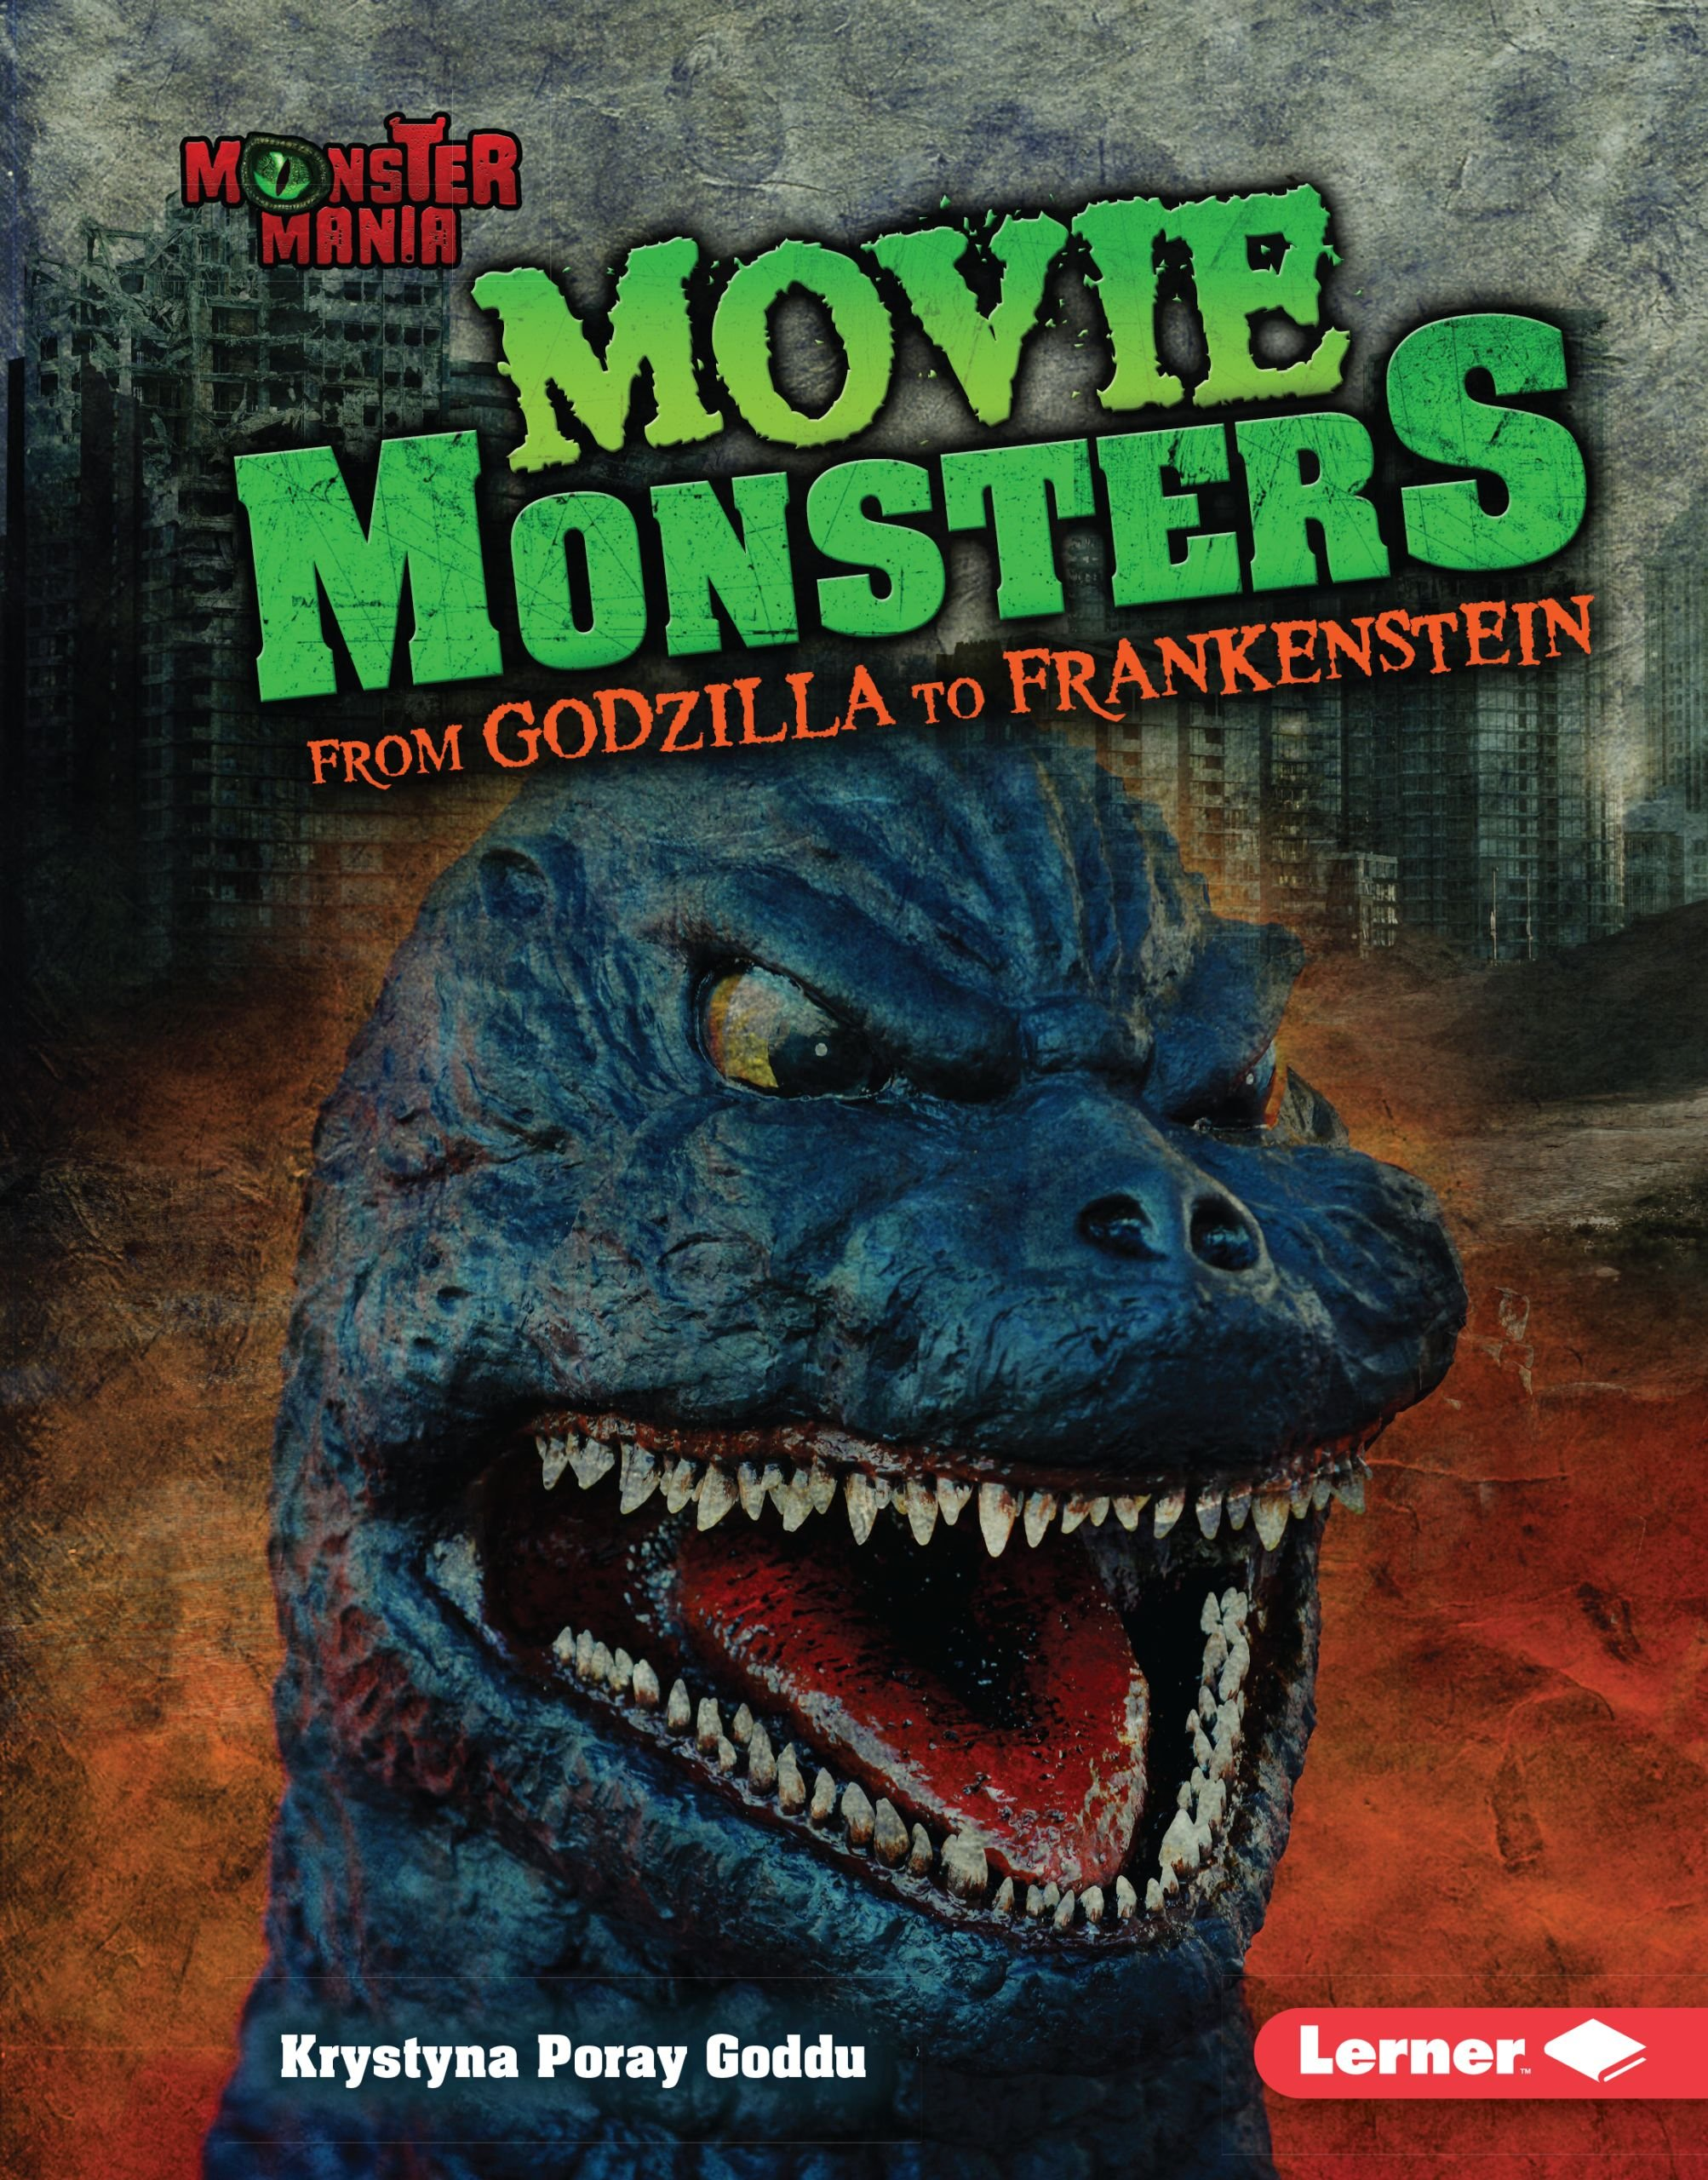 Movie Monsters From Godzilla To Frankenstein Monster Mania Goddu Krystyna Poray 9781512425918 Amazon Com Books